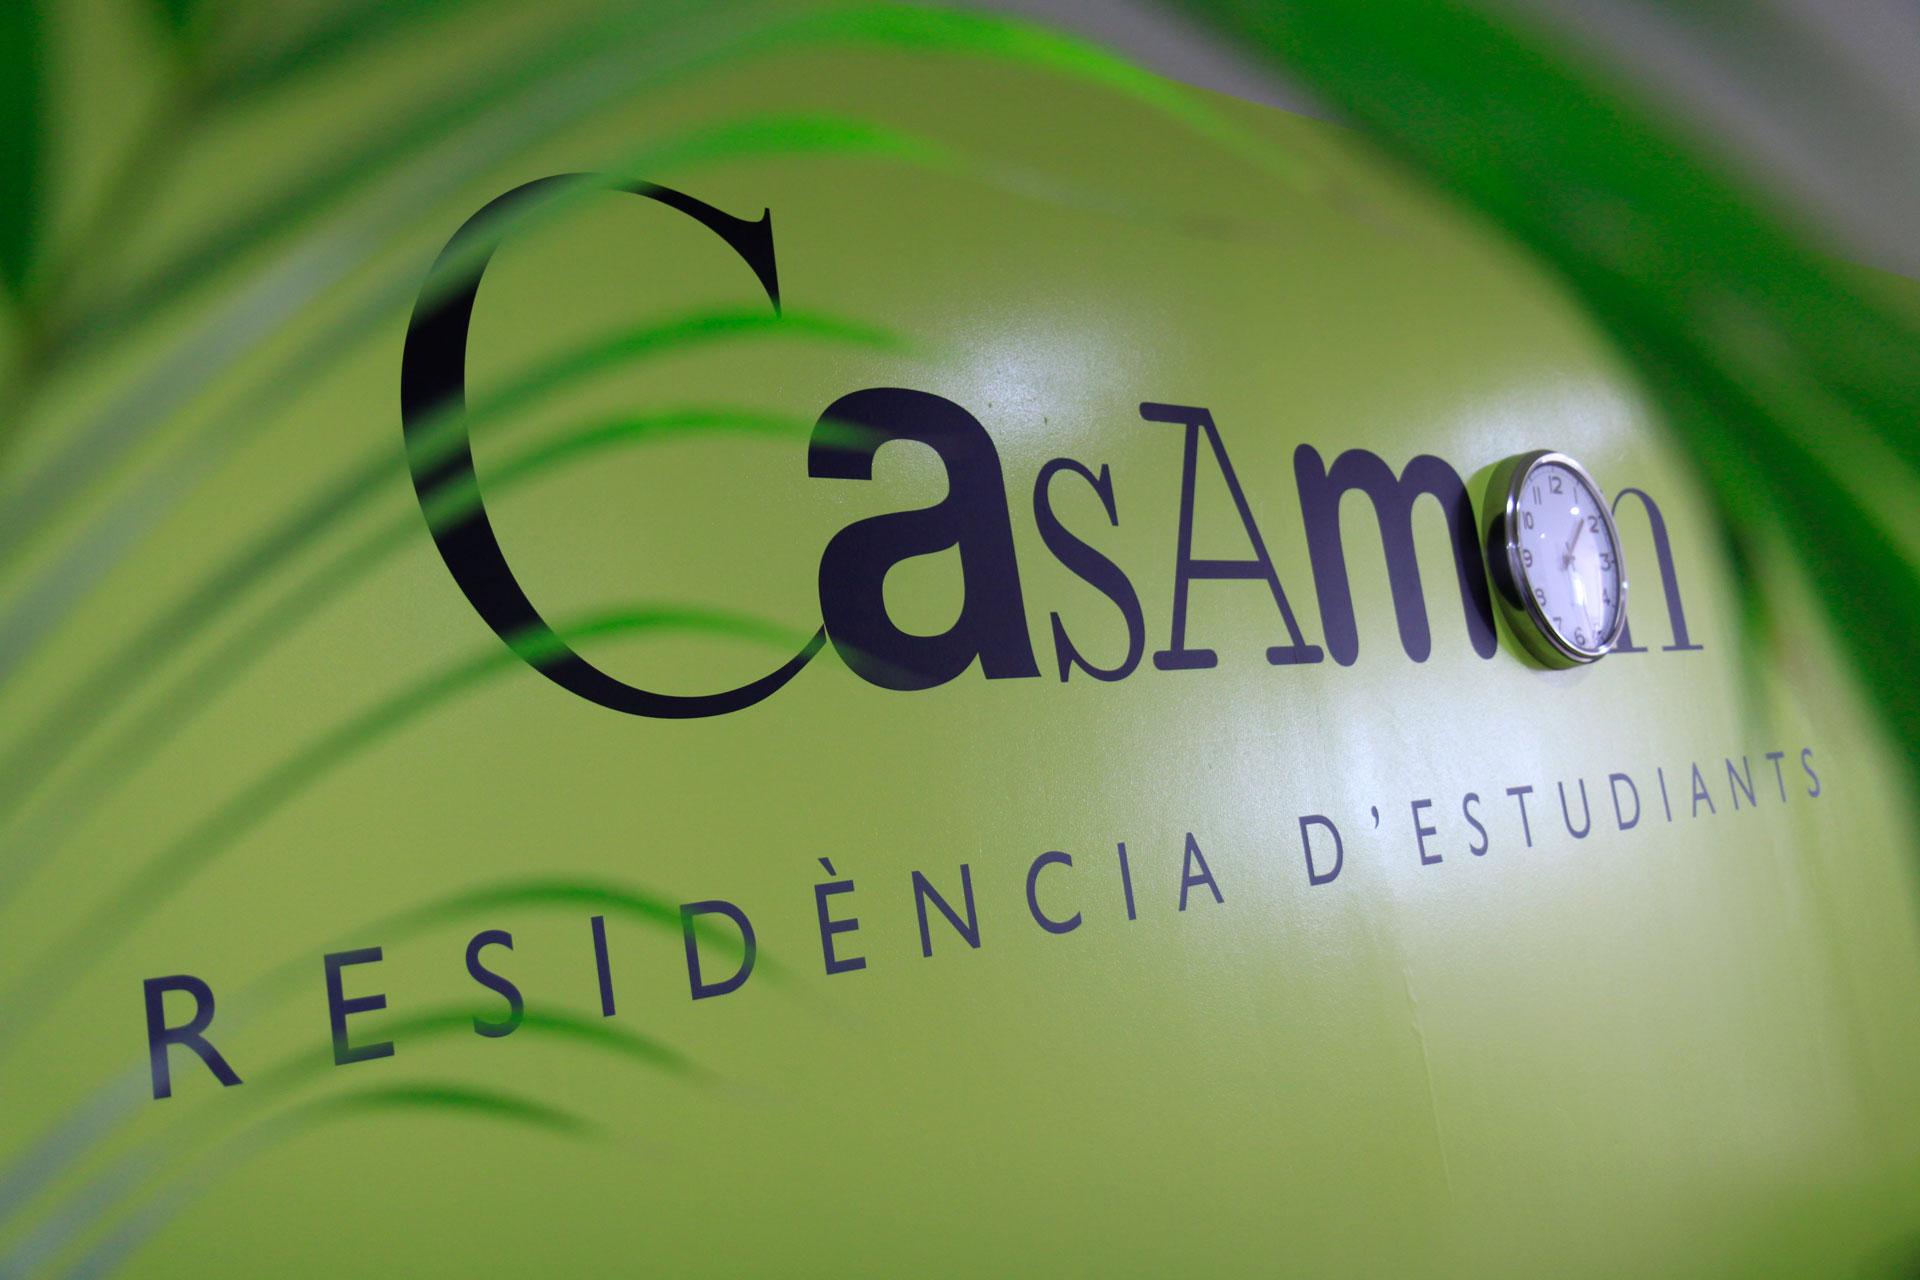 Casamon House